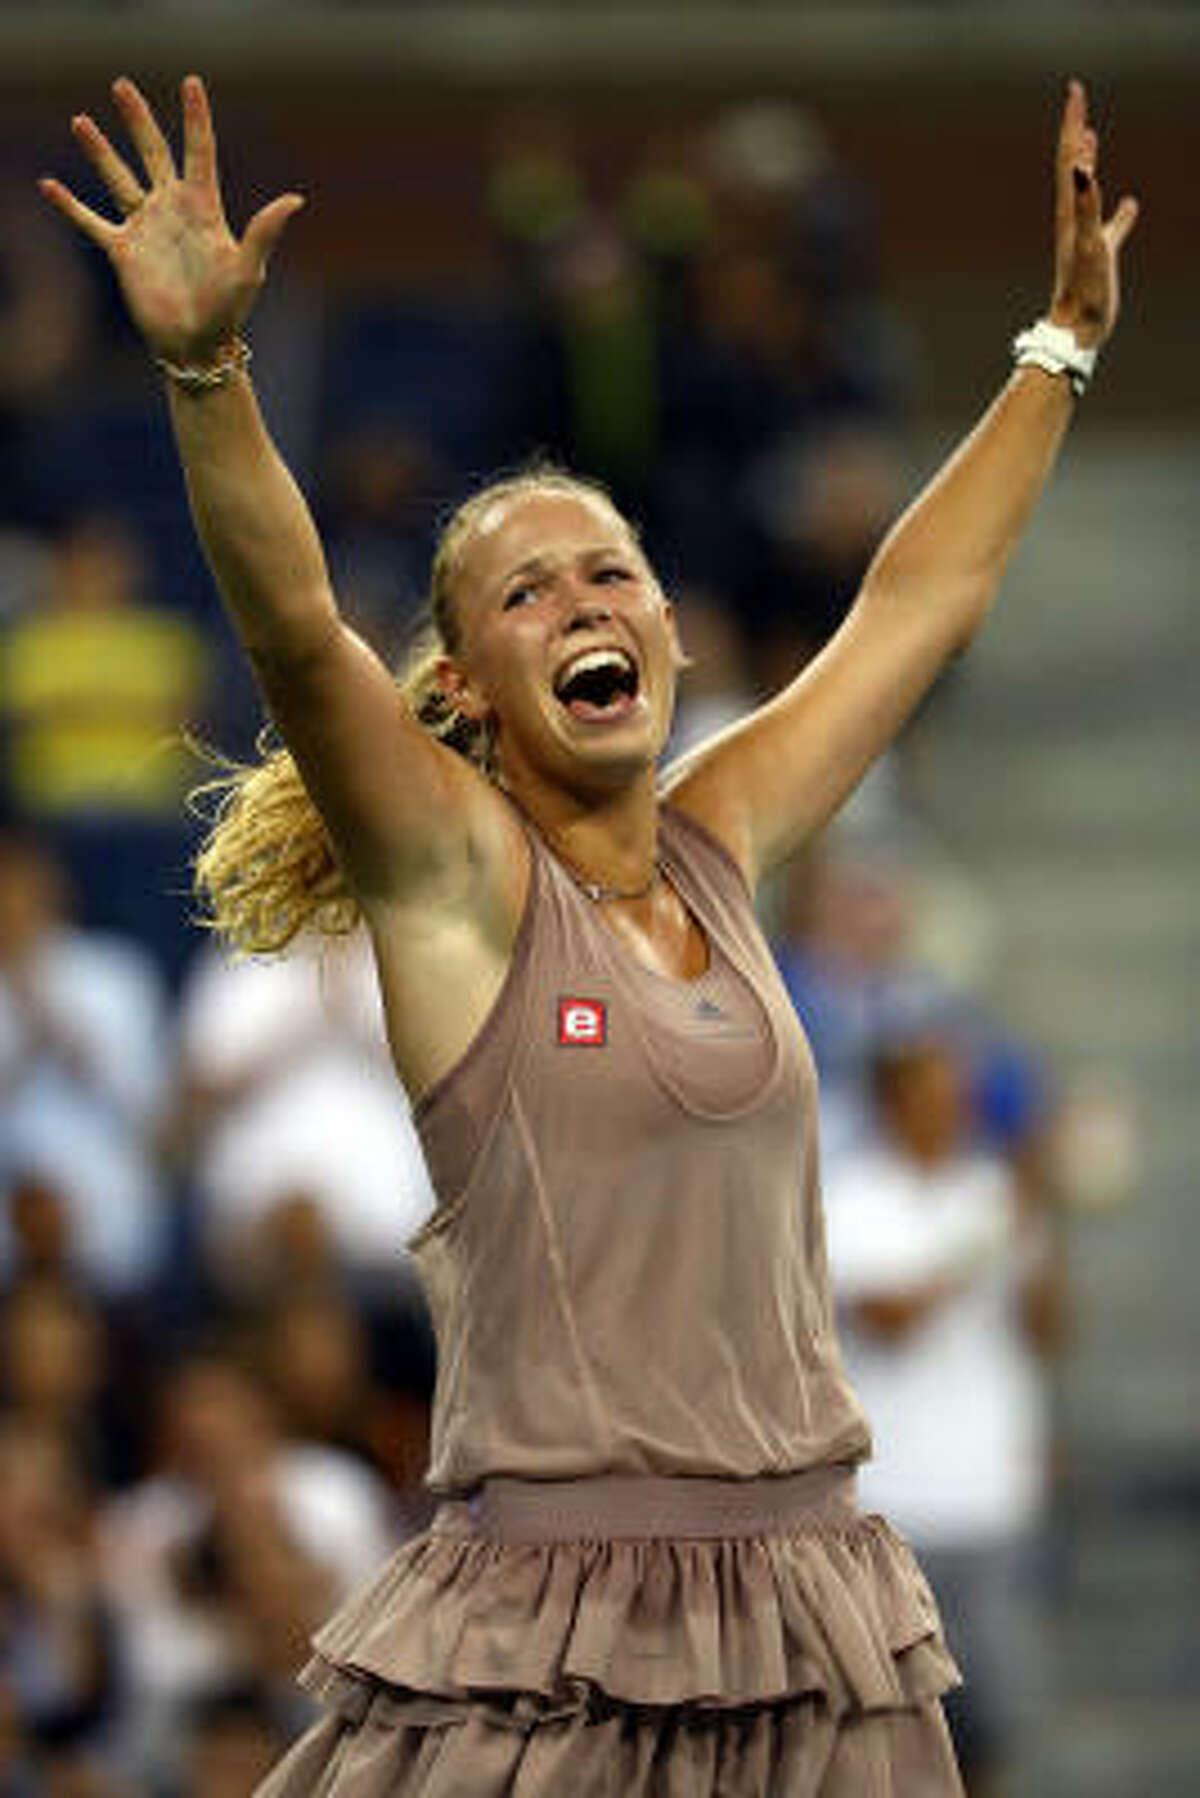 Caroline Wozniacki of Denmark reacts after defeating Svetlana Kuznetsova of Russia.